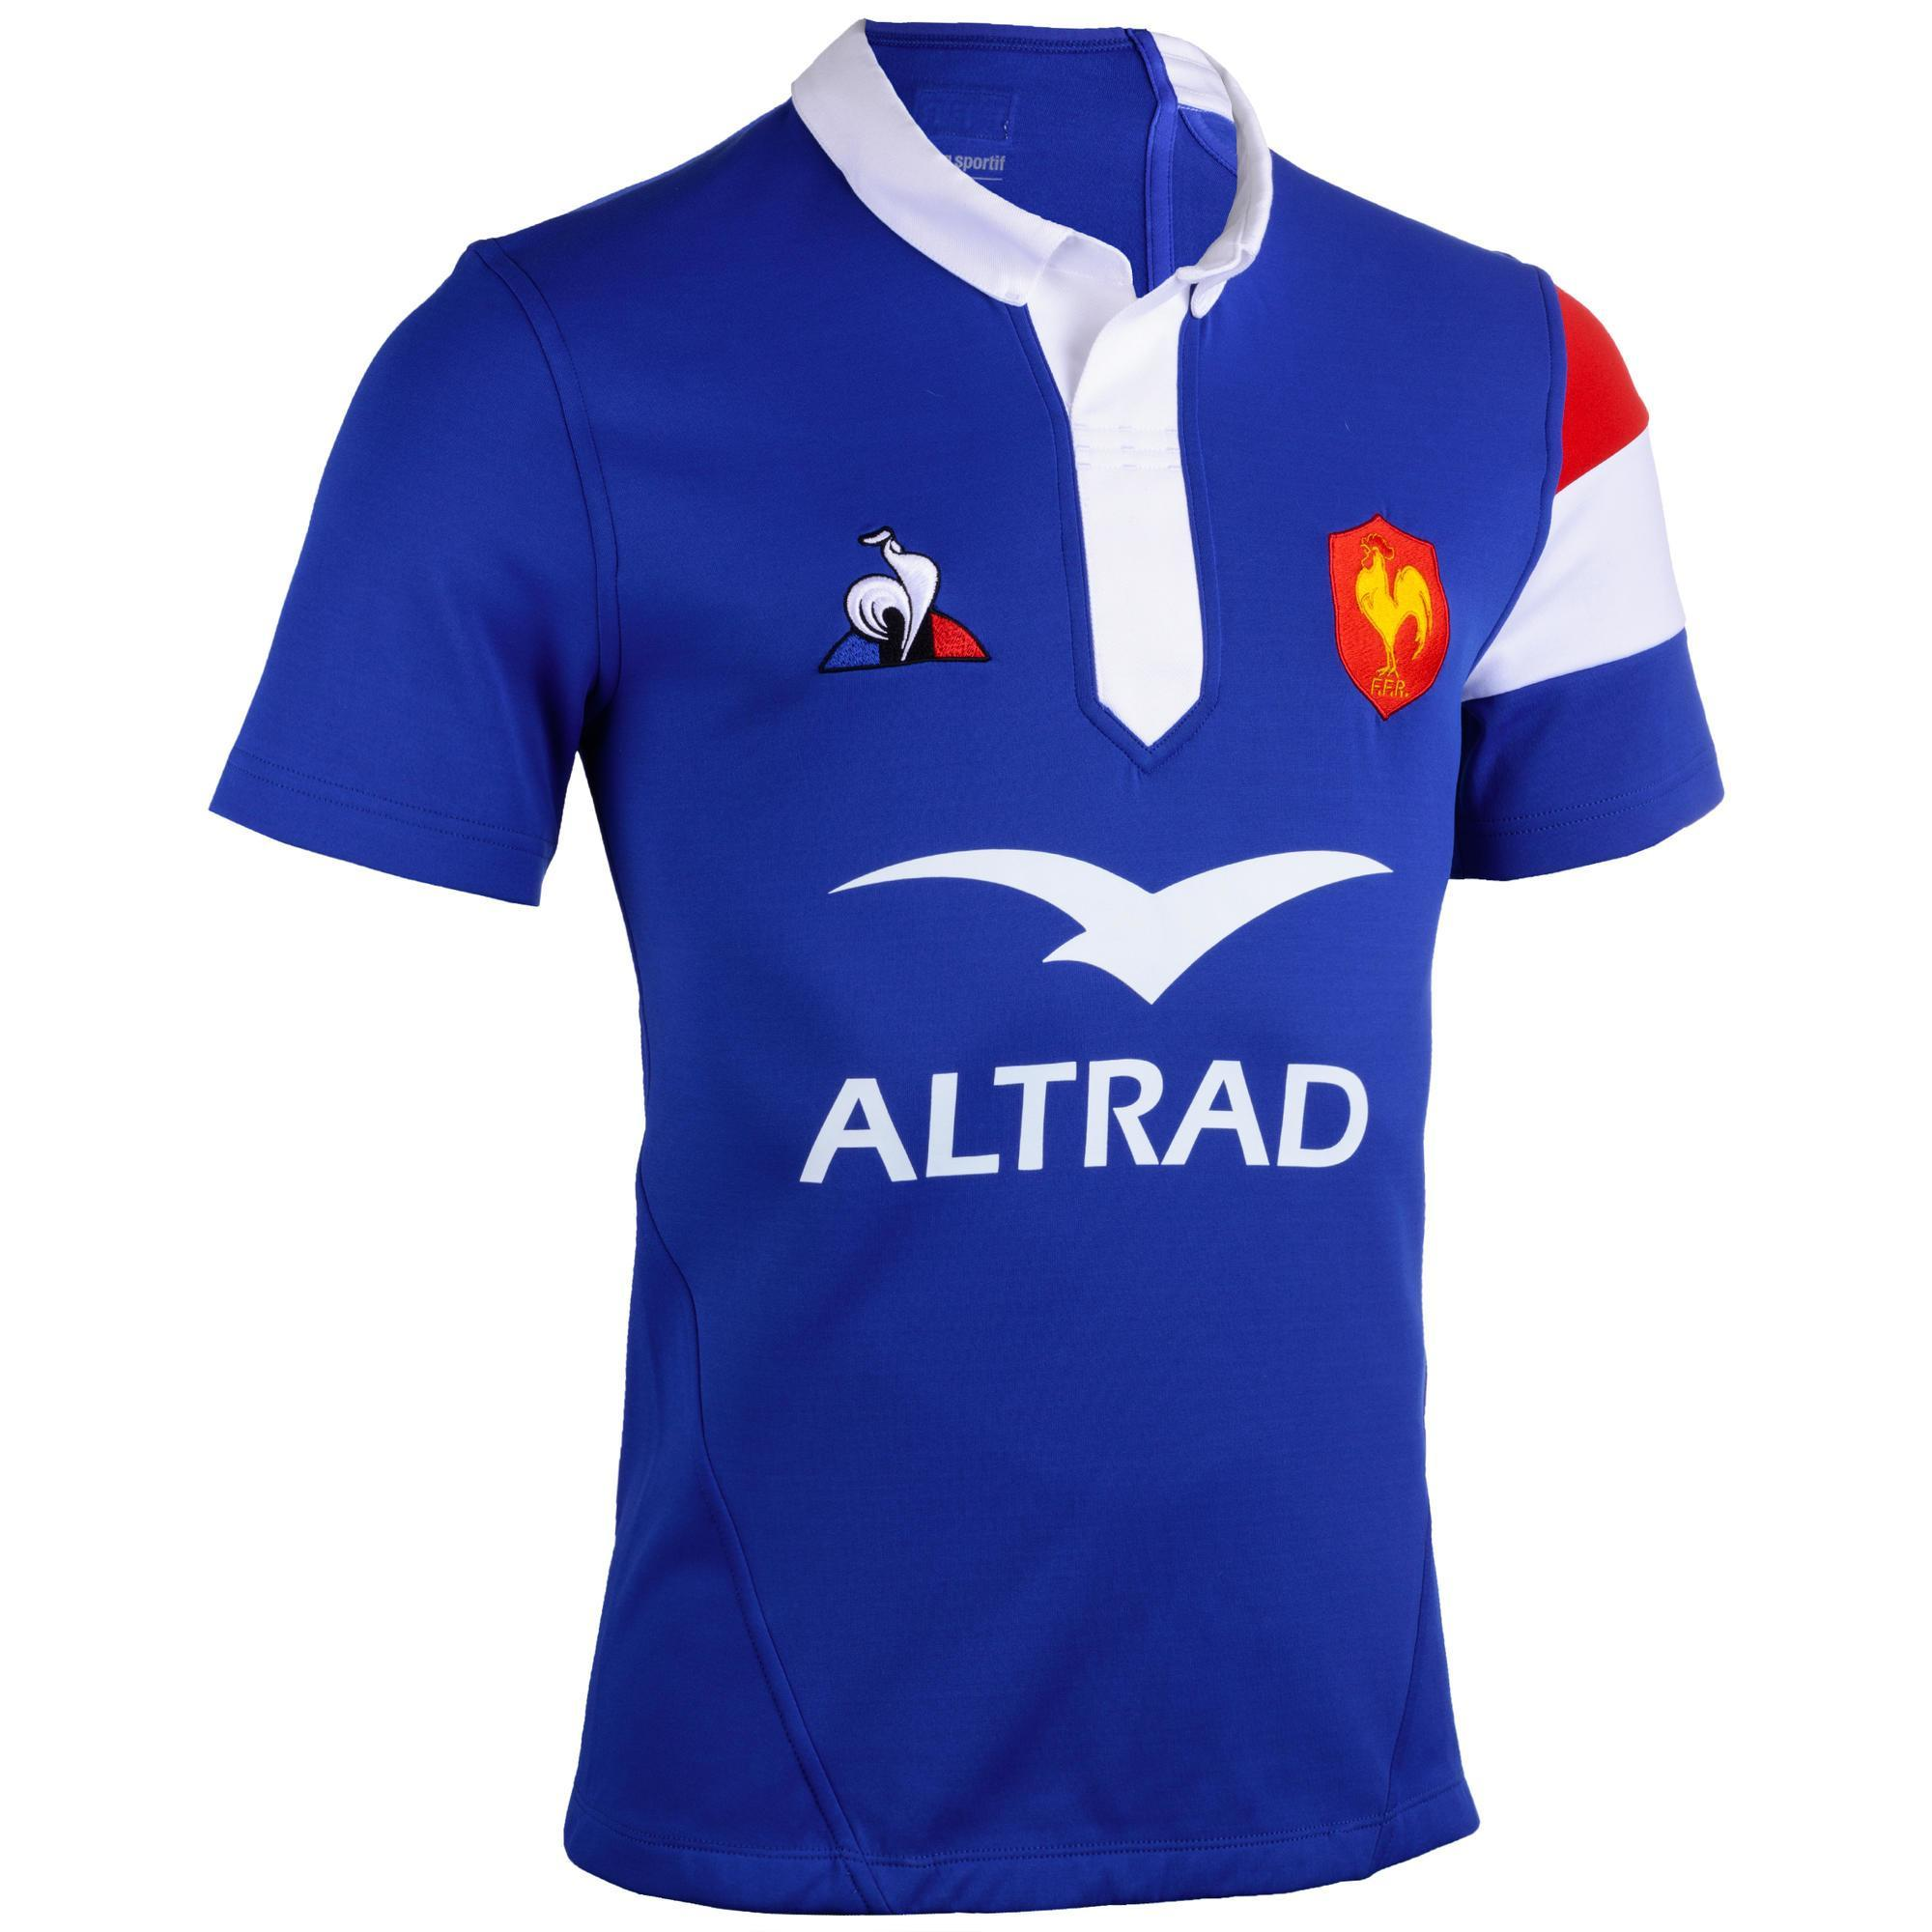 Coq sportif Shirt replica FFR XV de France thuisshirt blauw volwassenen 2018/2019